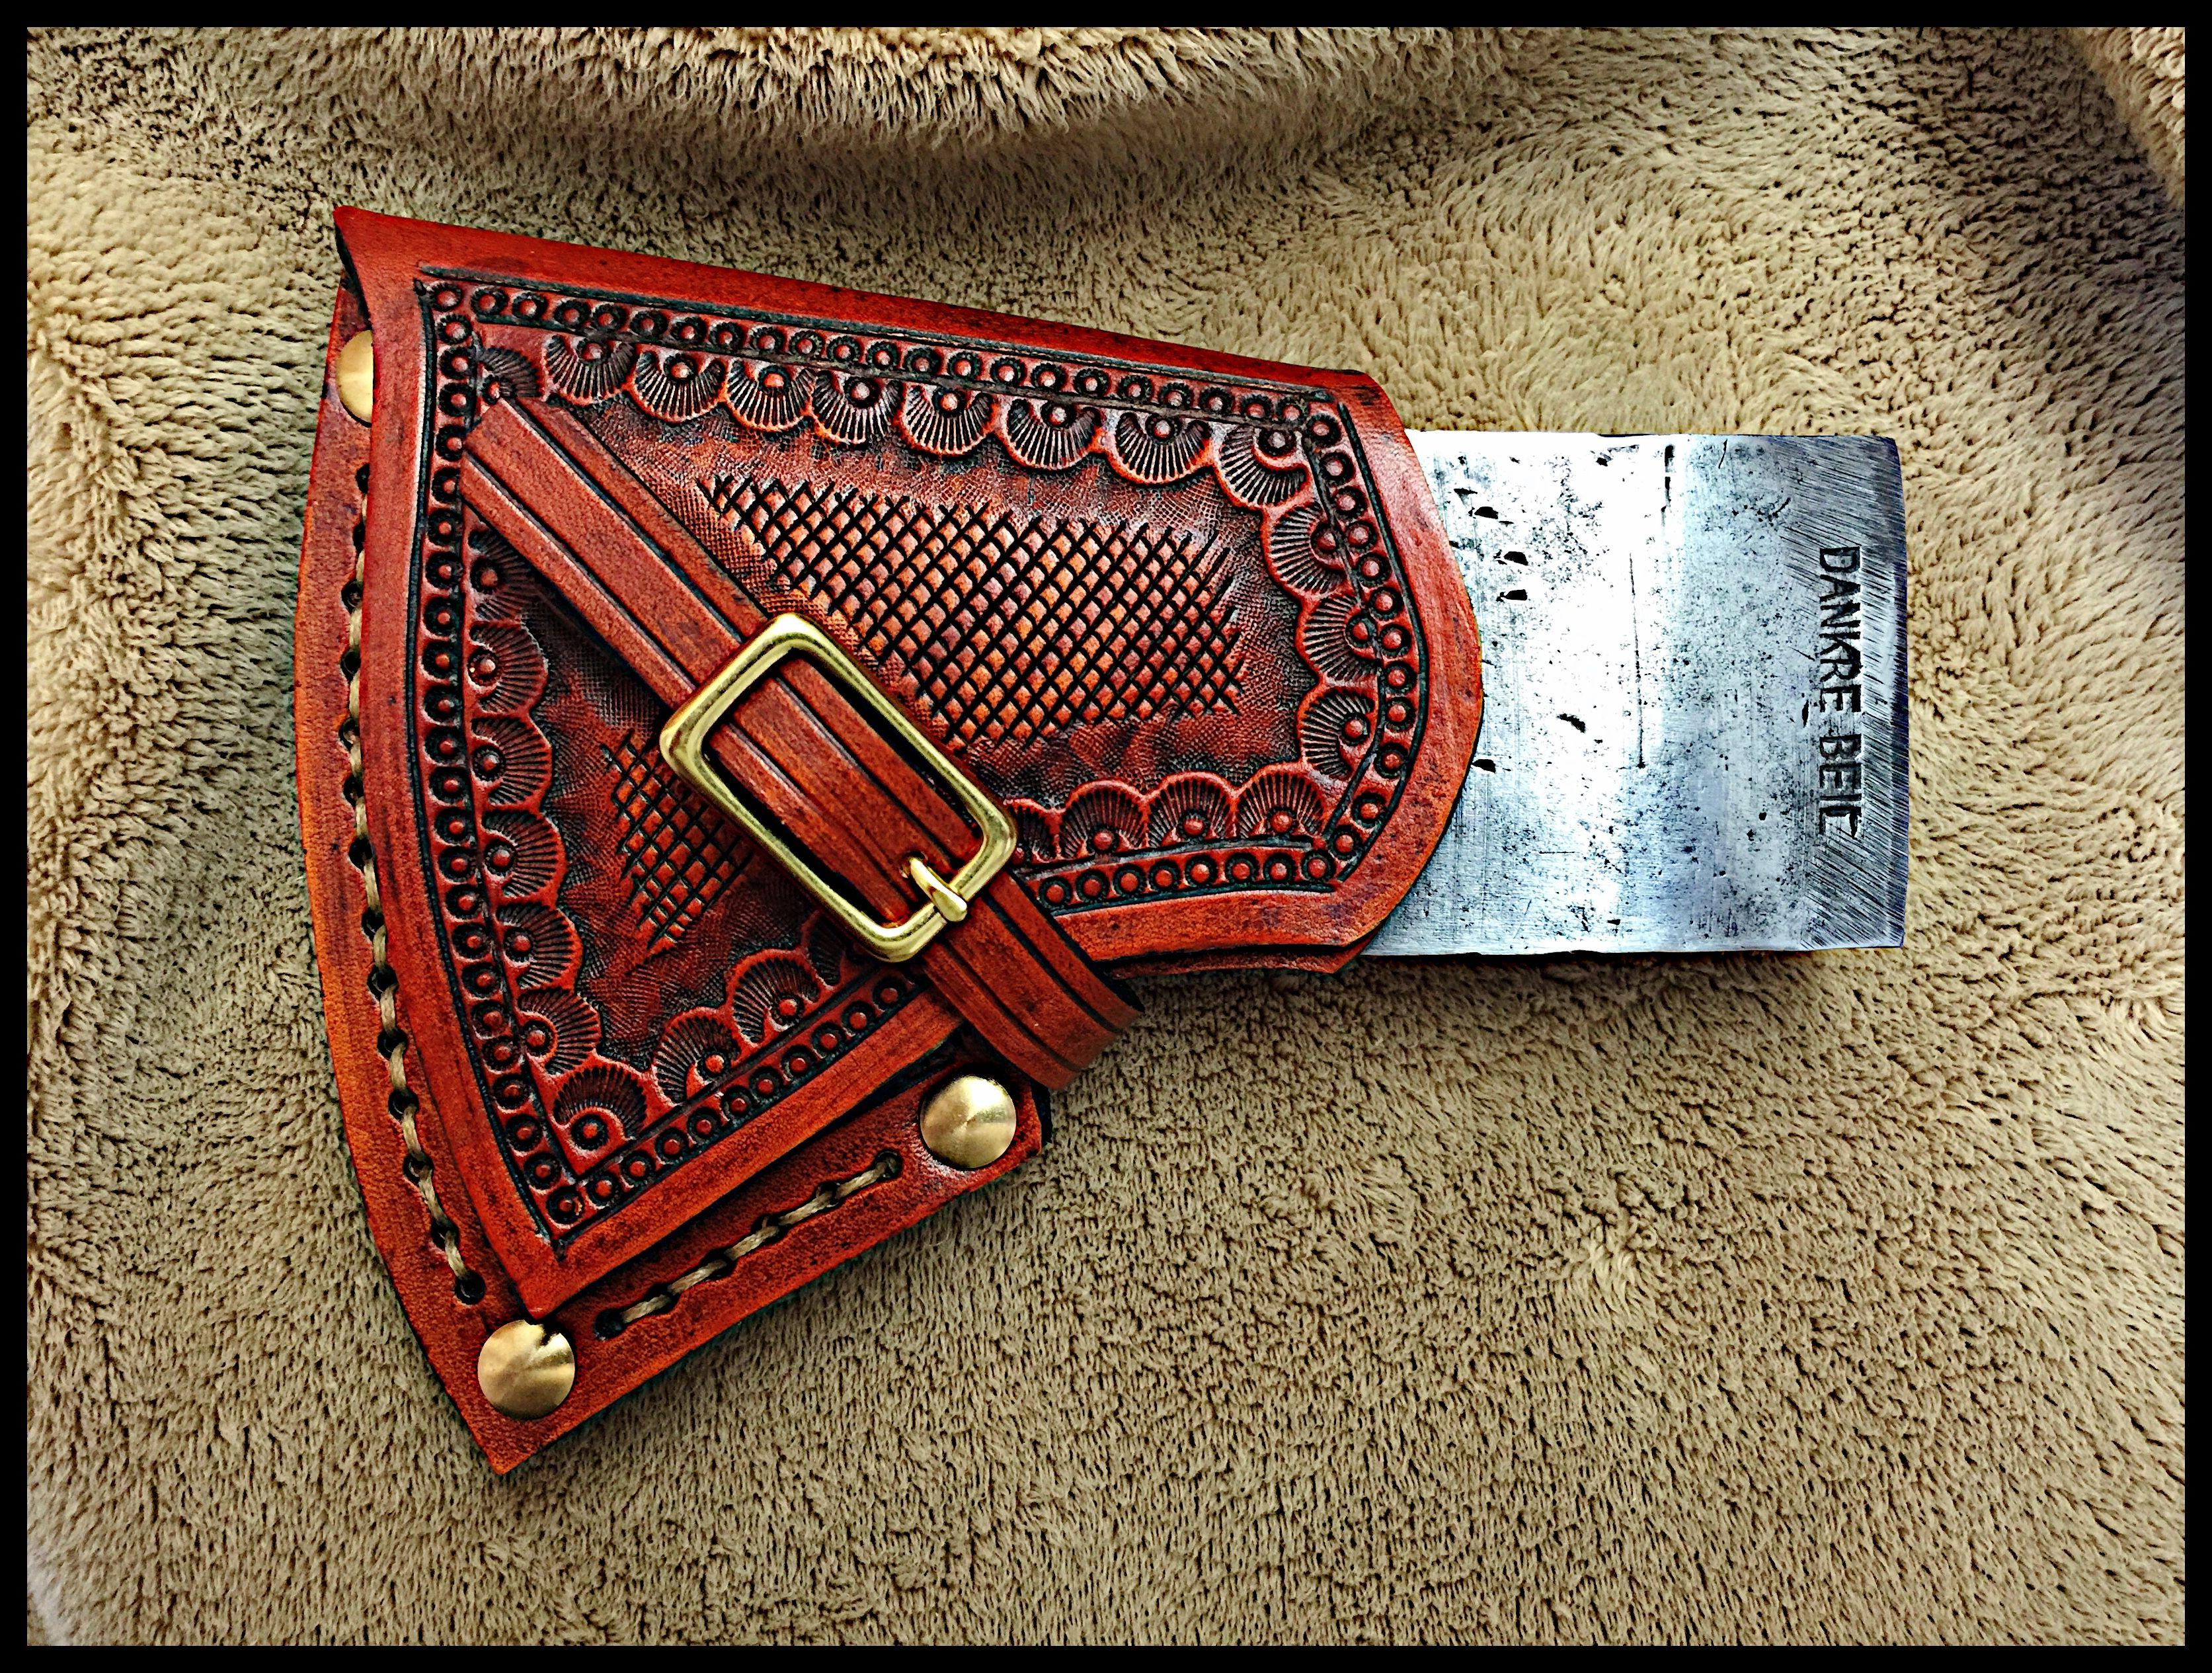 Custom Leather Sheath For An Quot Ochsenkopf Quot Ox Head Axe By